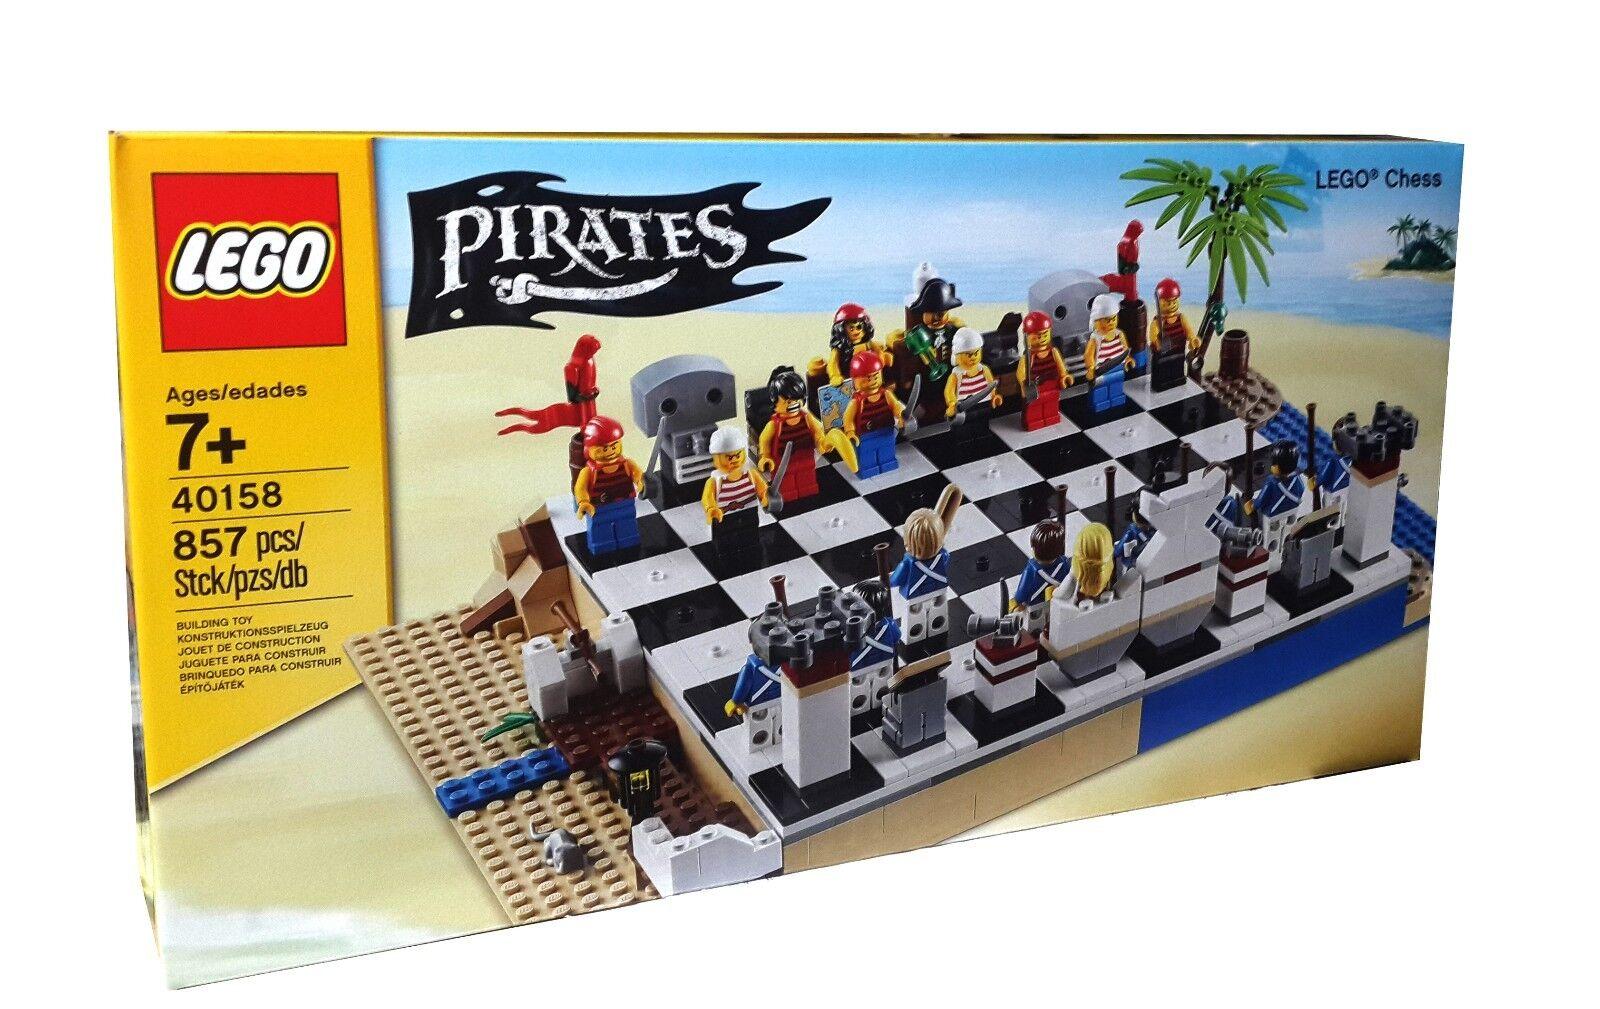 LEGO Pirate Series 40158 Lego Pirates Chess Chess Chess (New) 3950fb